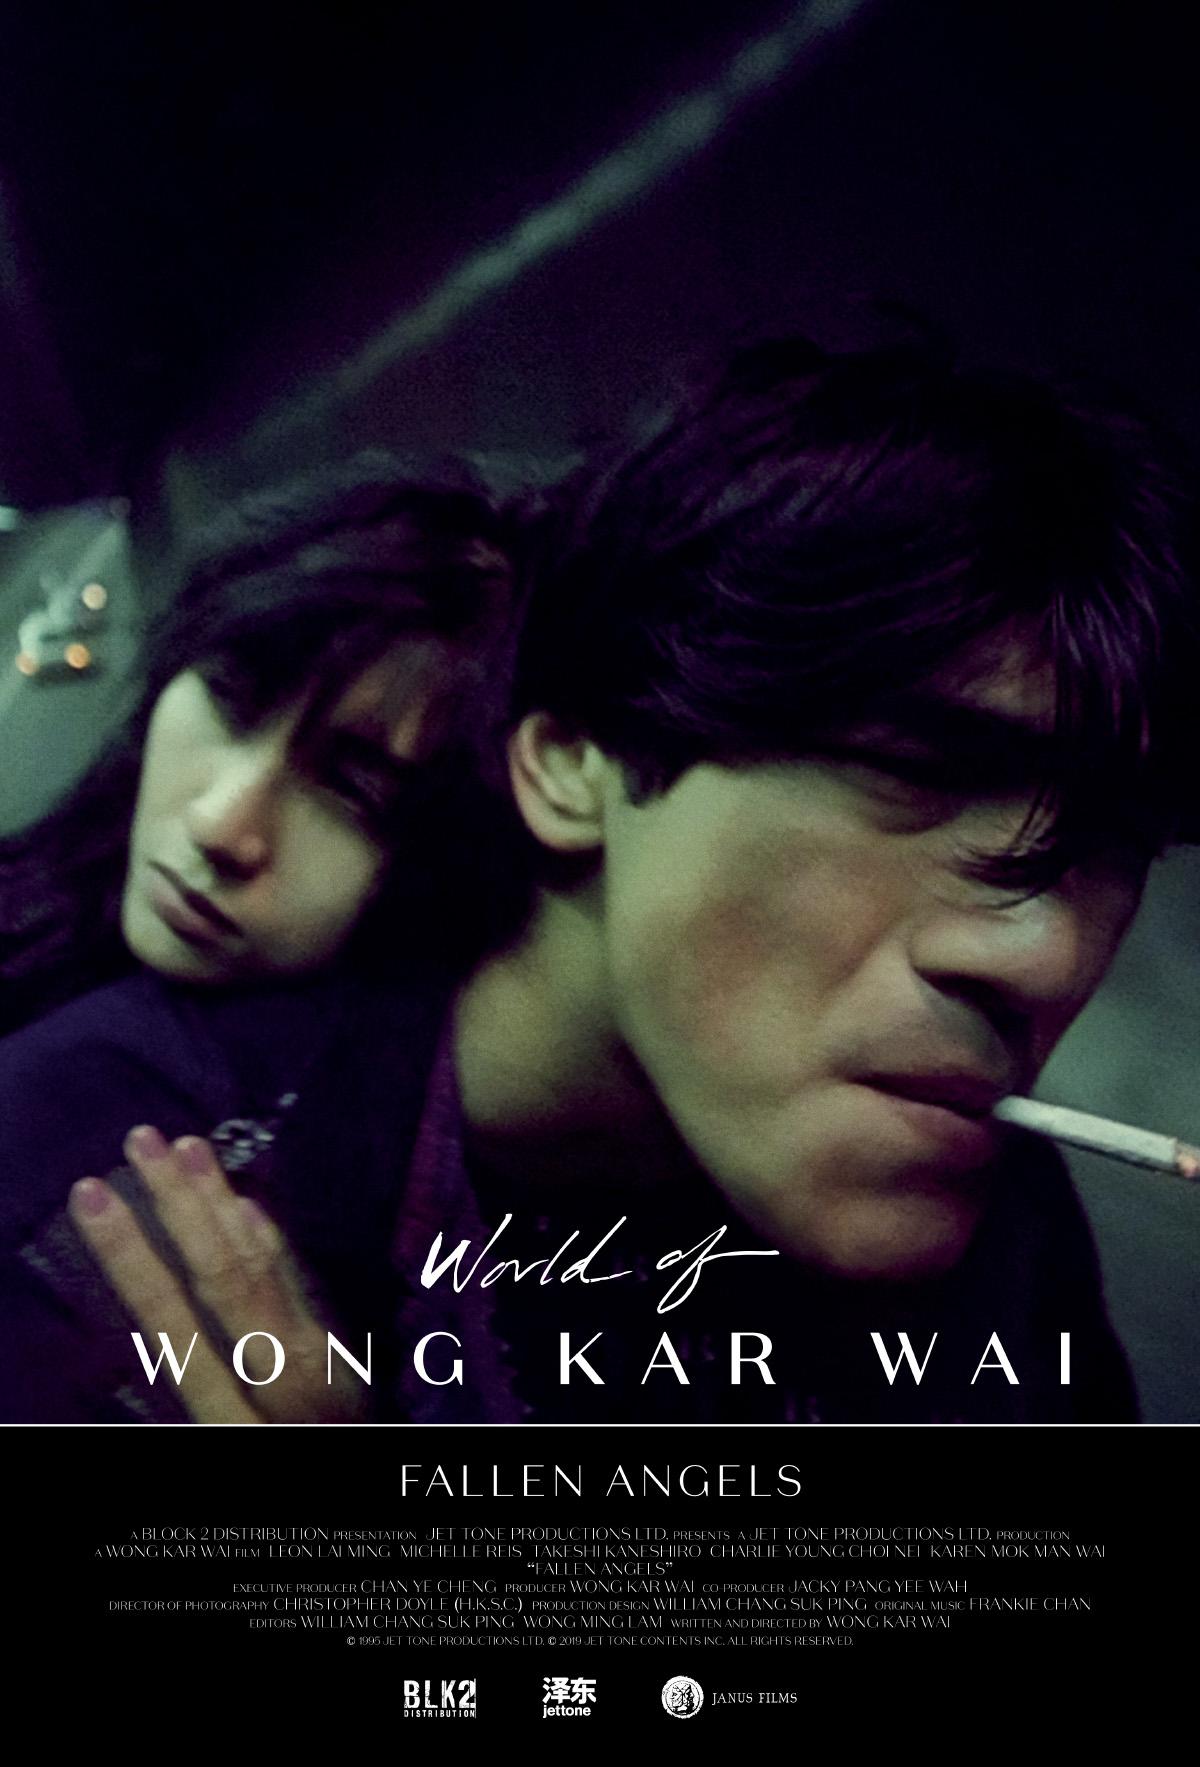 Poster for Fallen Angels (1995)